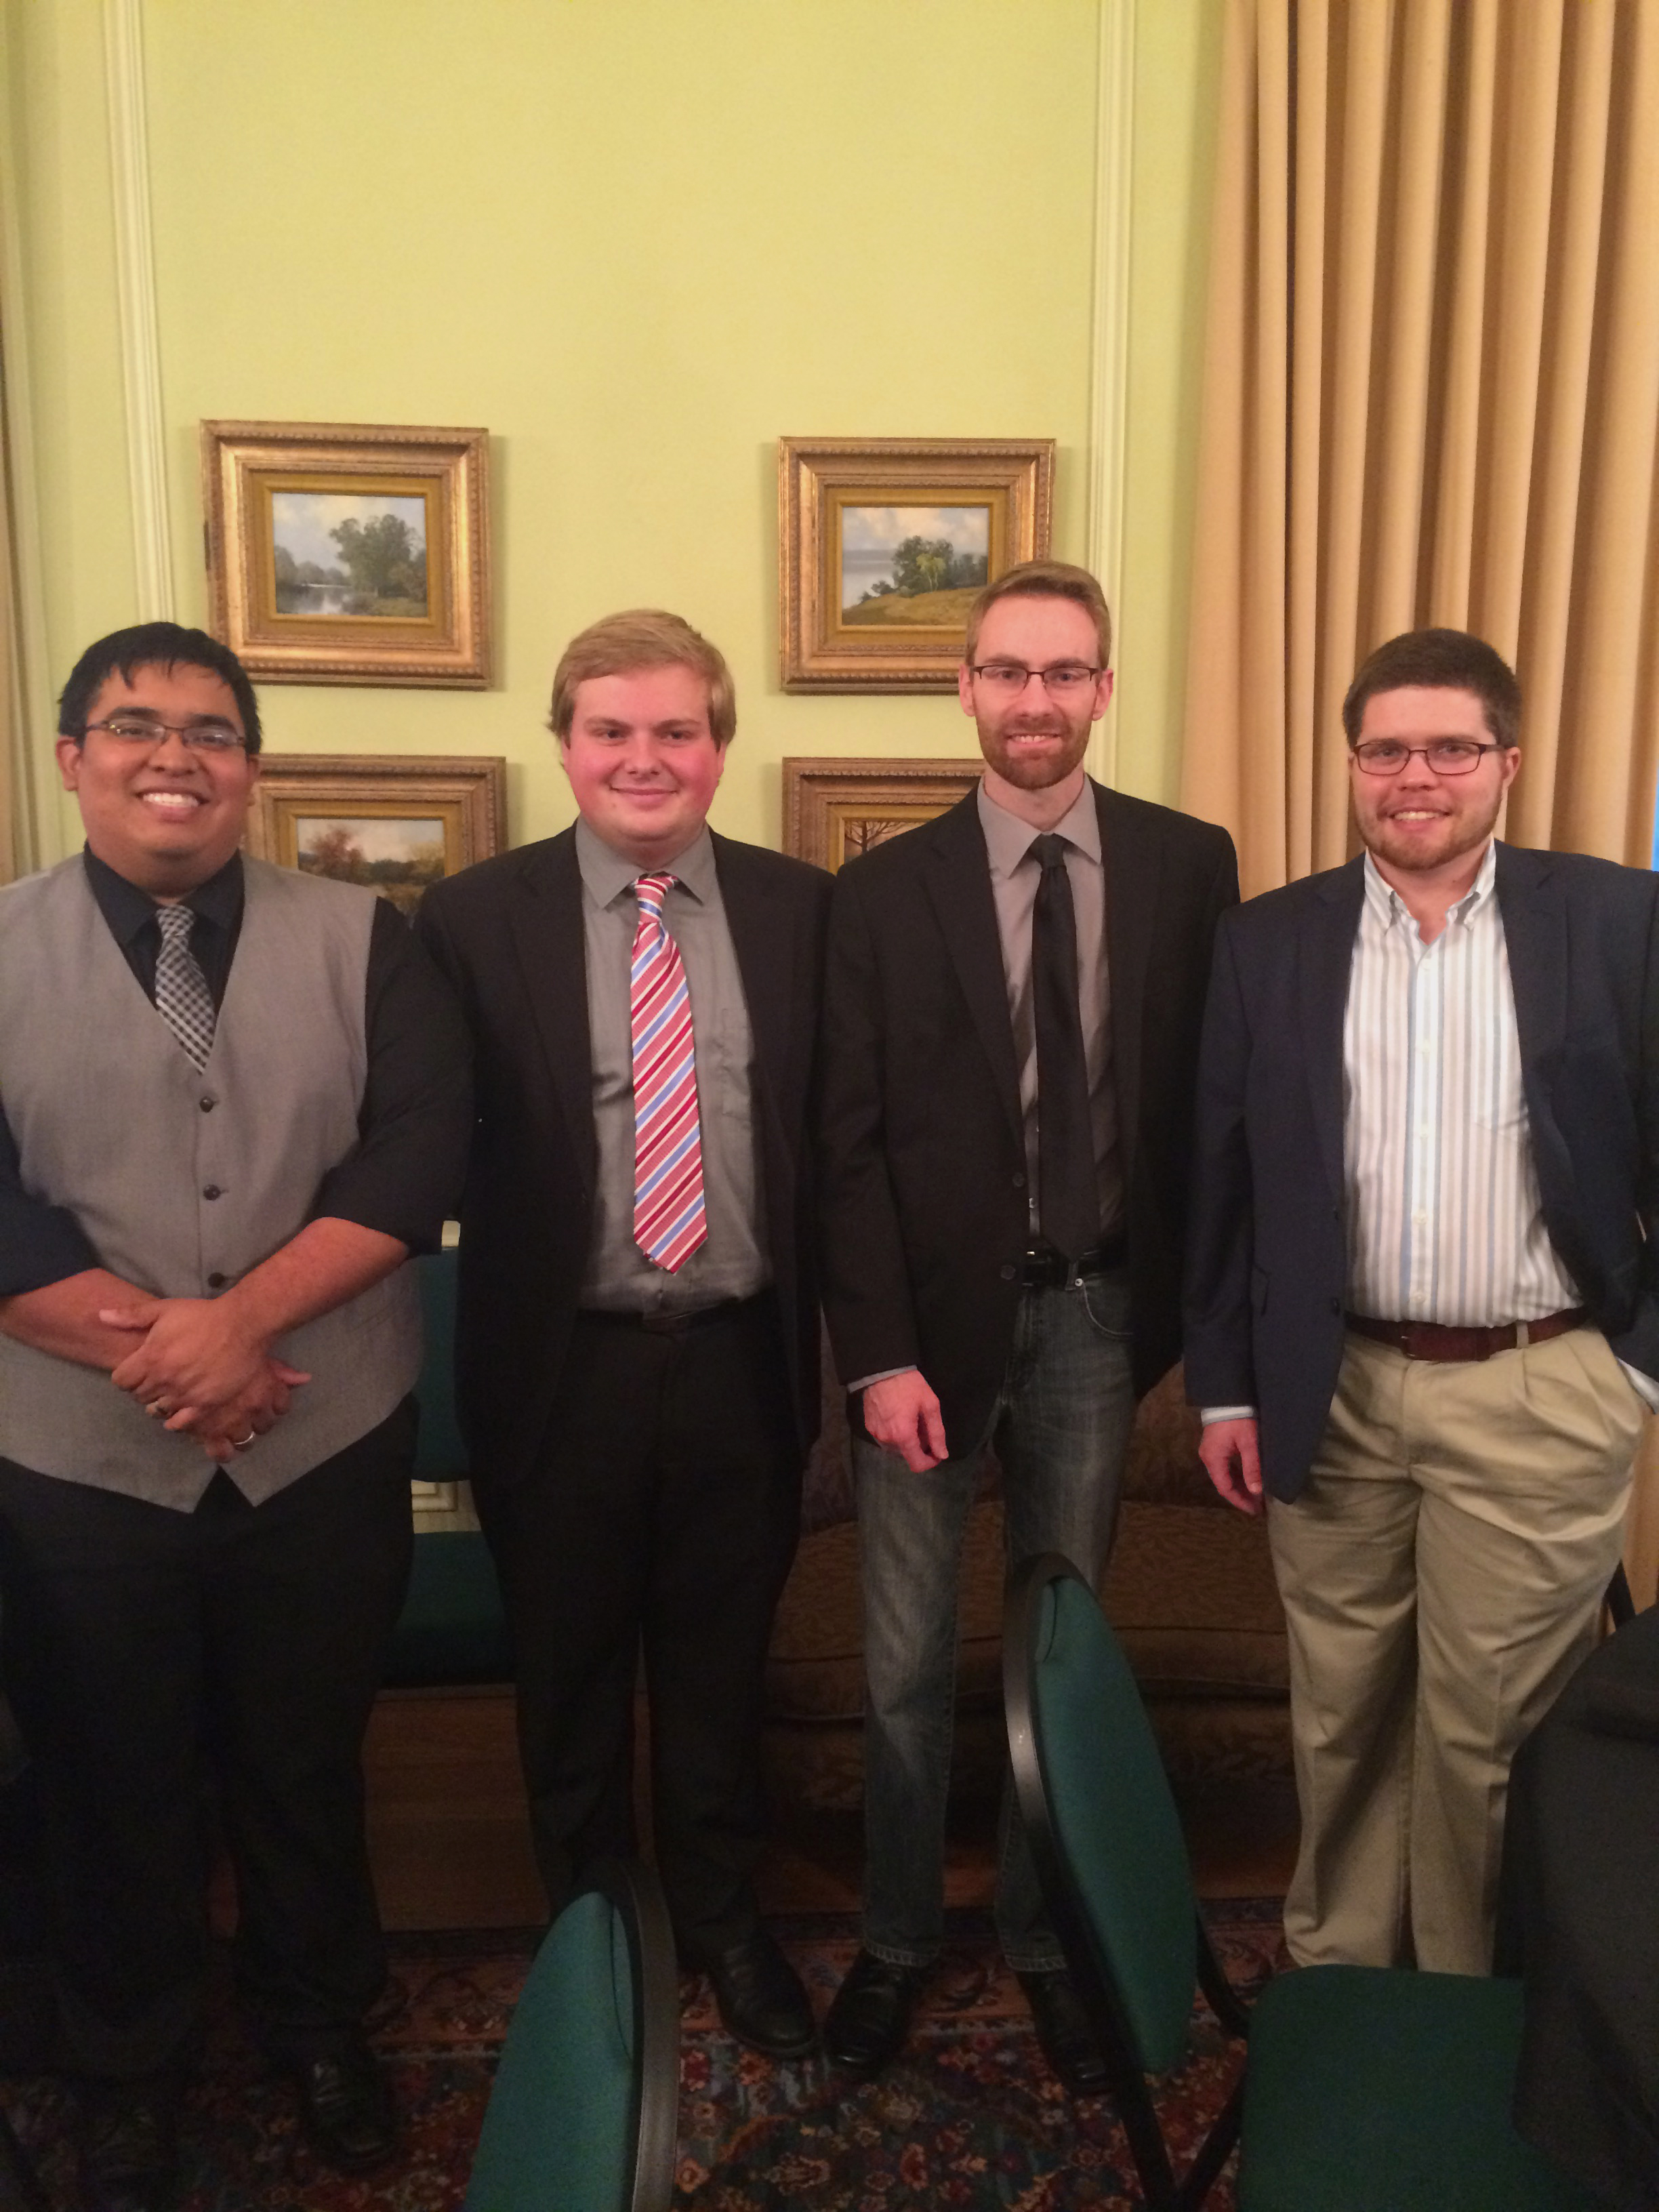 Guittard Dinner 2016 - Student Recipients